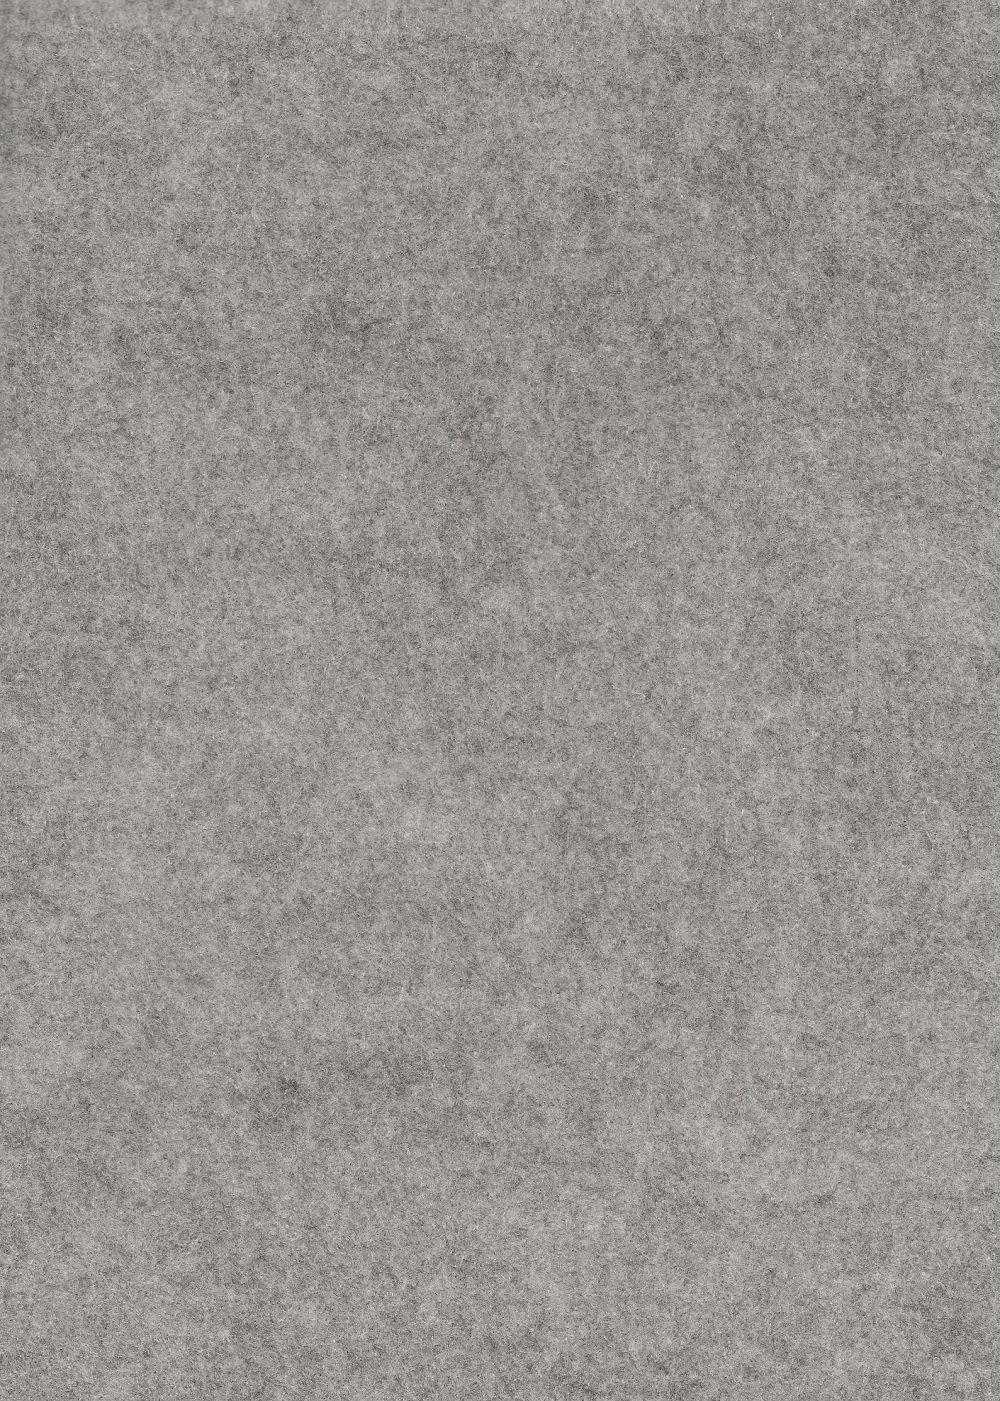 Smokey Marble - 12 x 18 Square